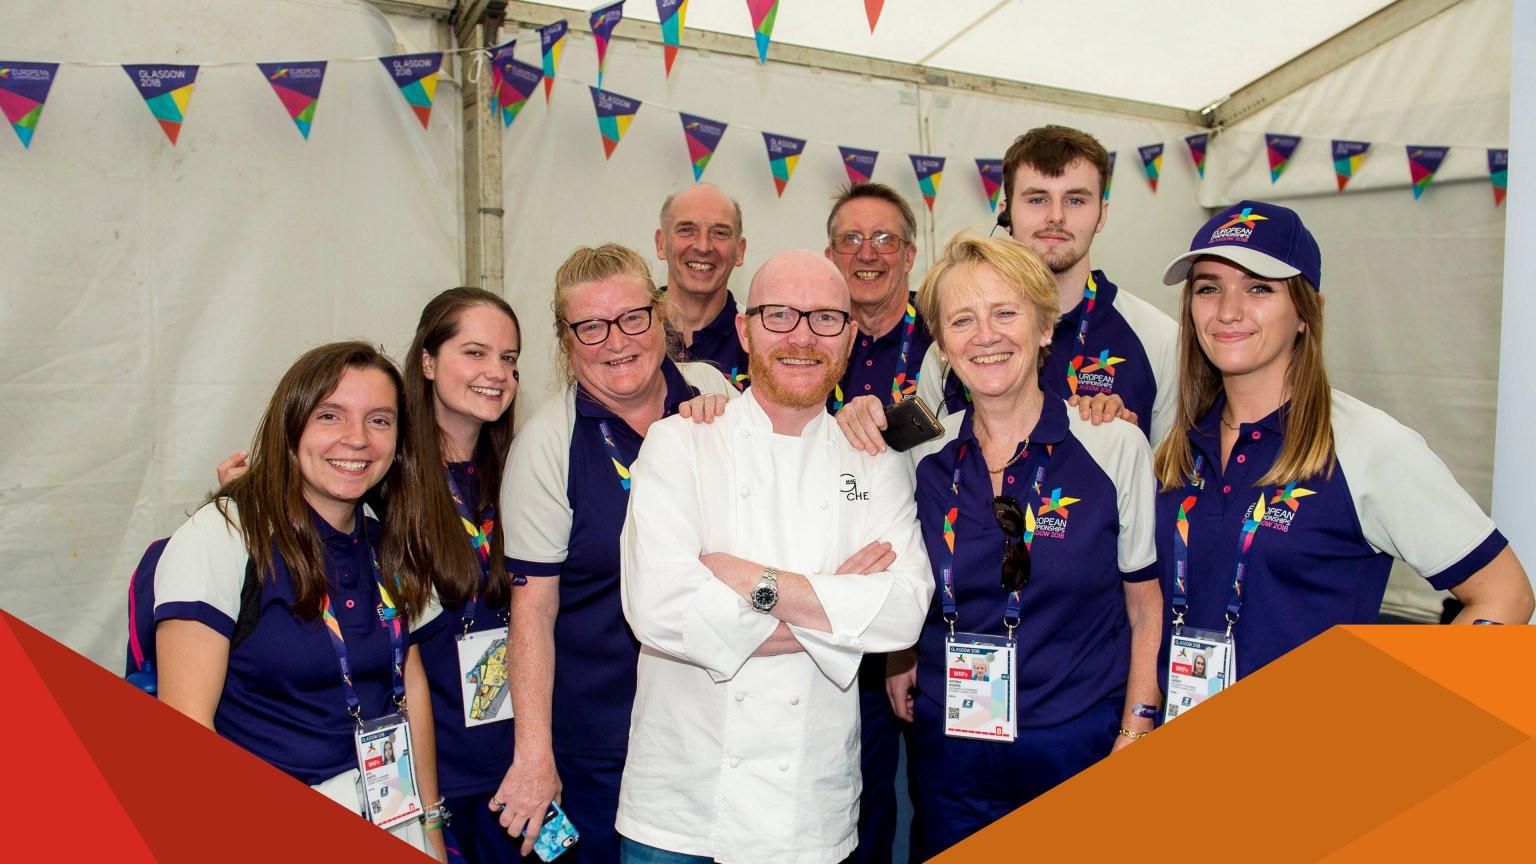 European Championships Munich 2022 inviting volunteer applications